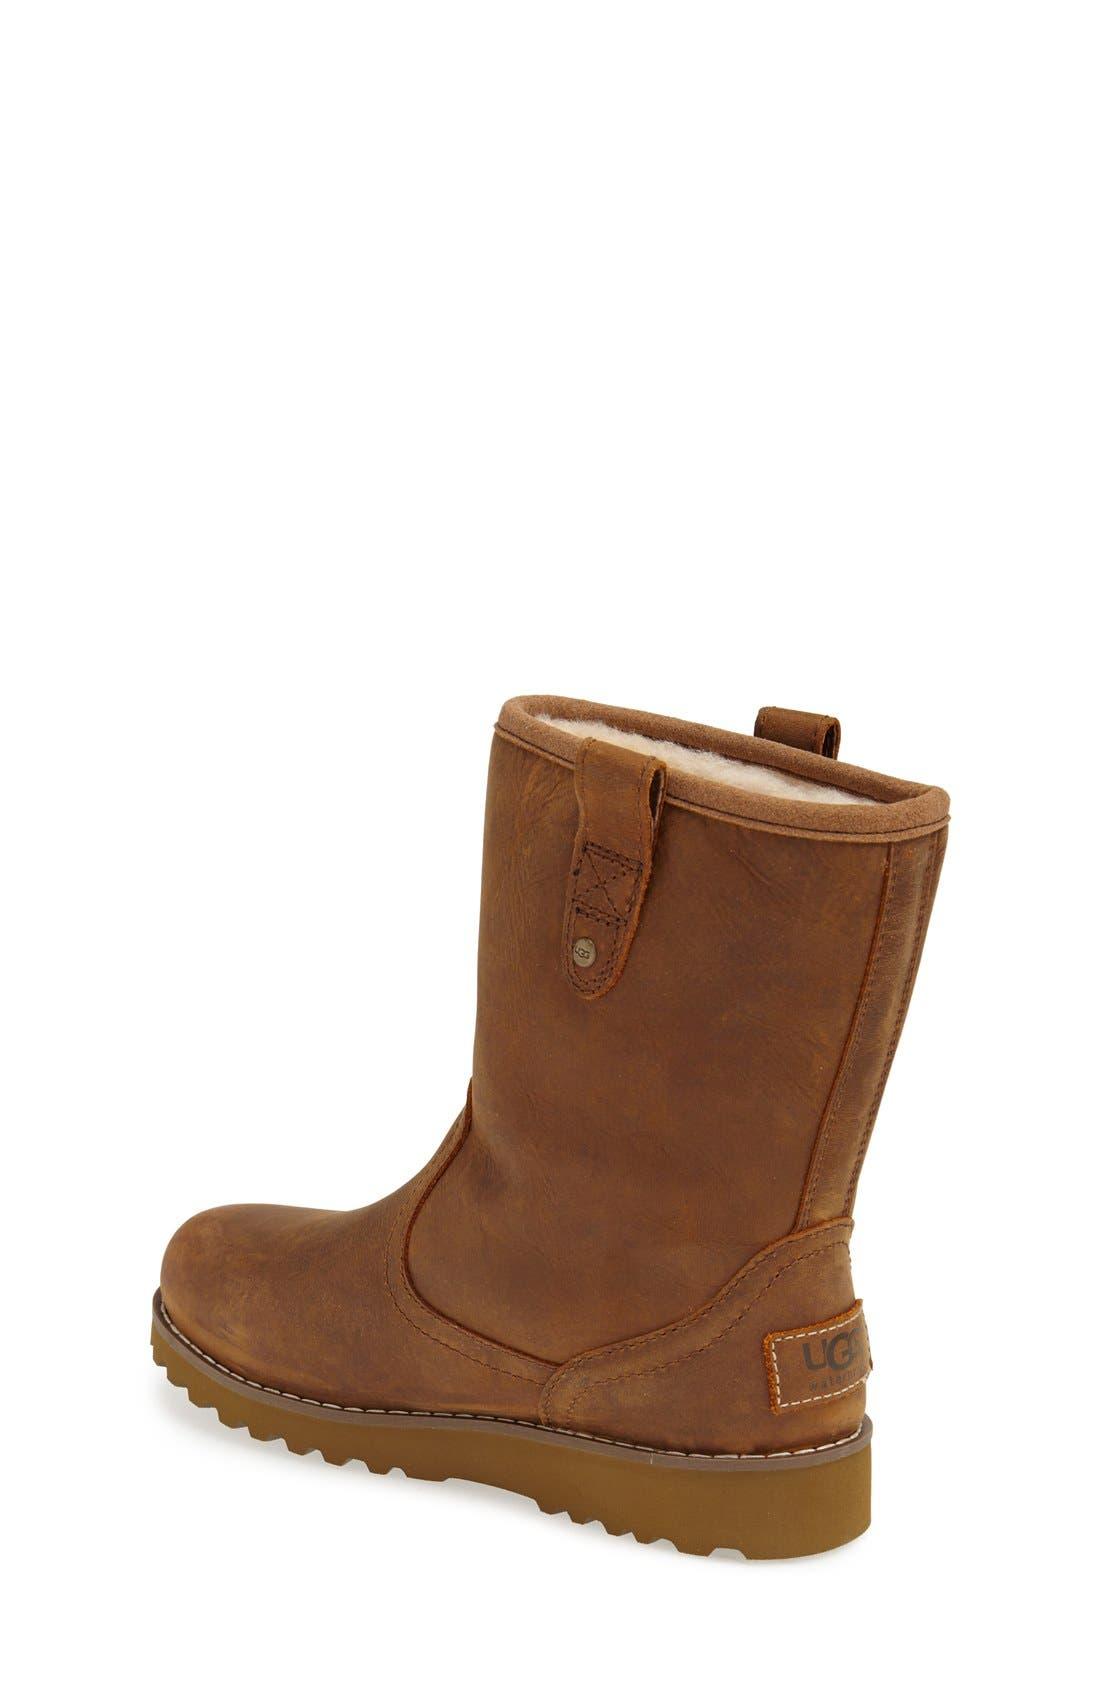 Alternate Image 2  - UGG® 'Redwood' Waterproof Boot (Toddler, Little Kid & Big Kid)